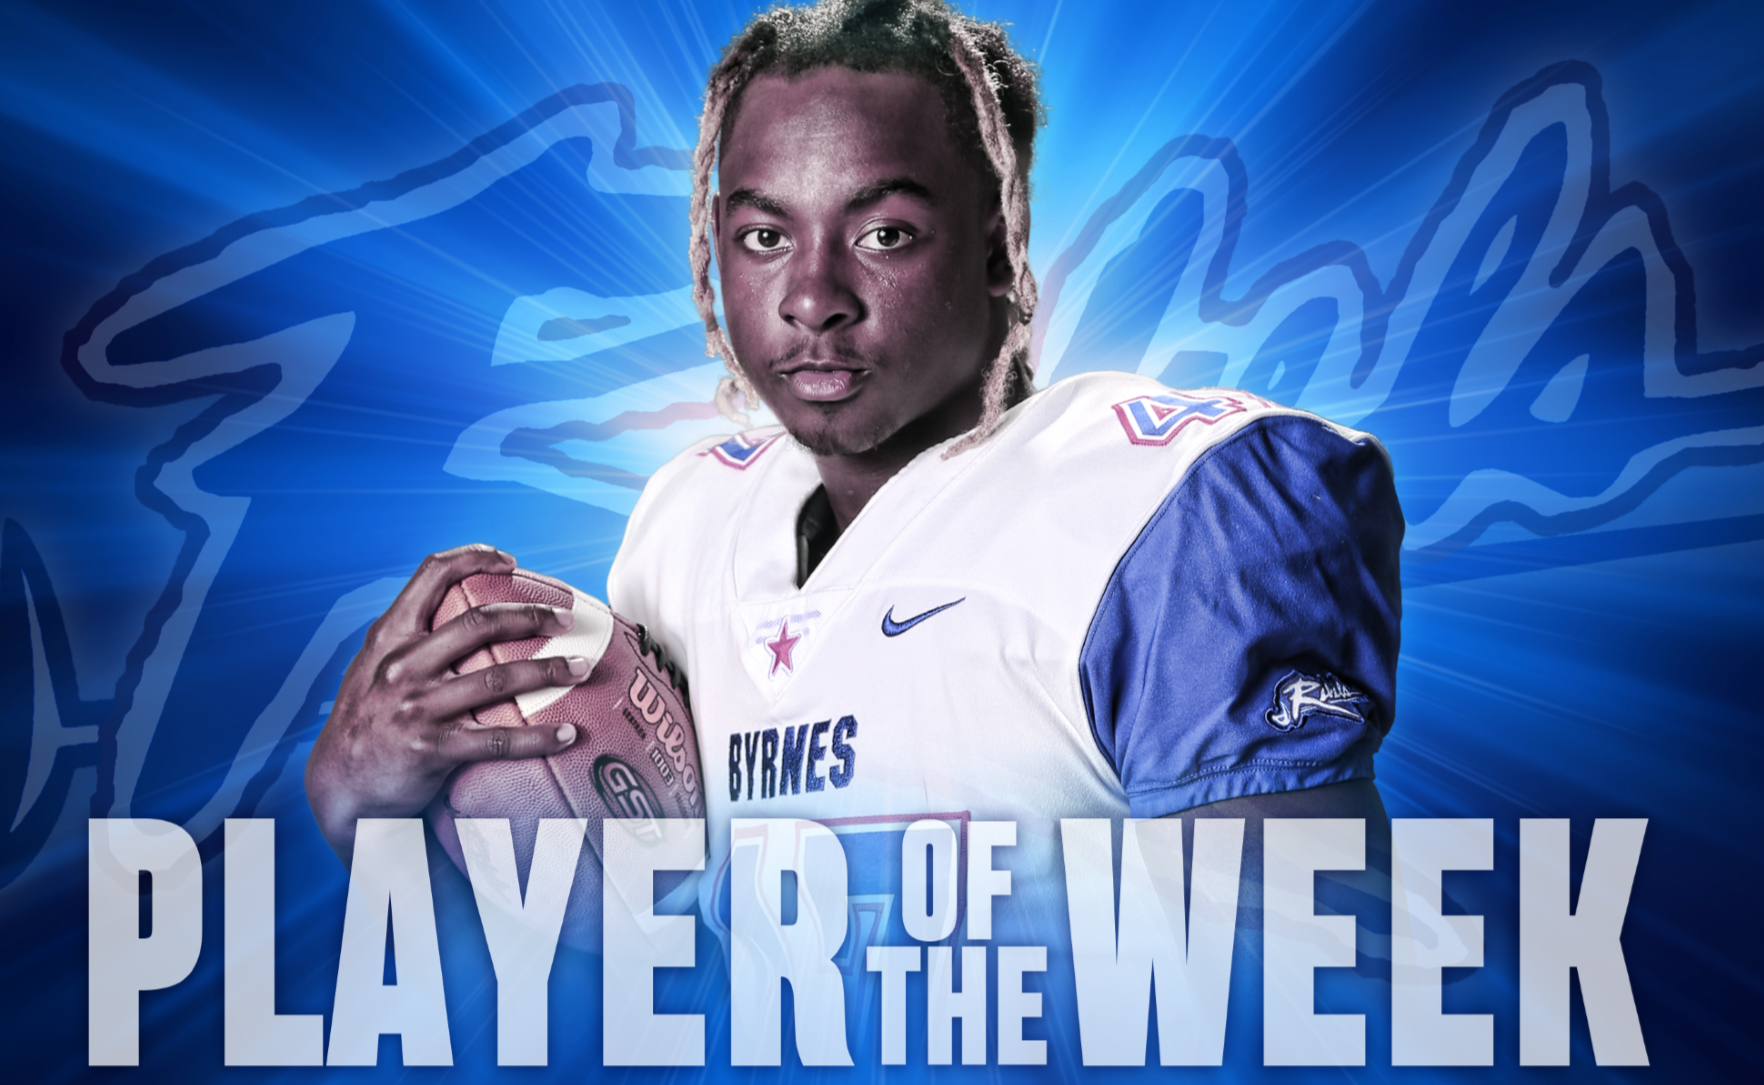 R. Harris Player of the Week